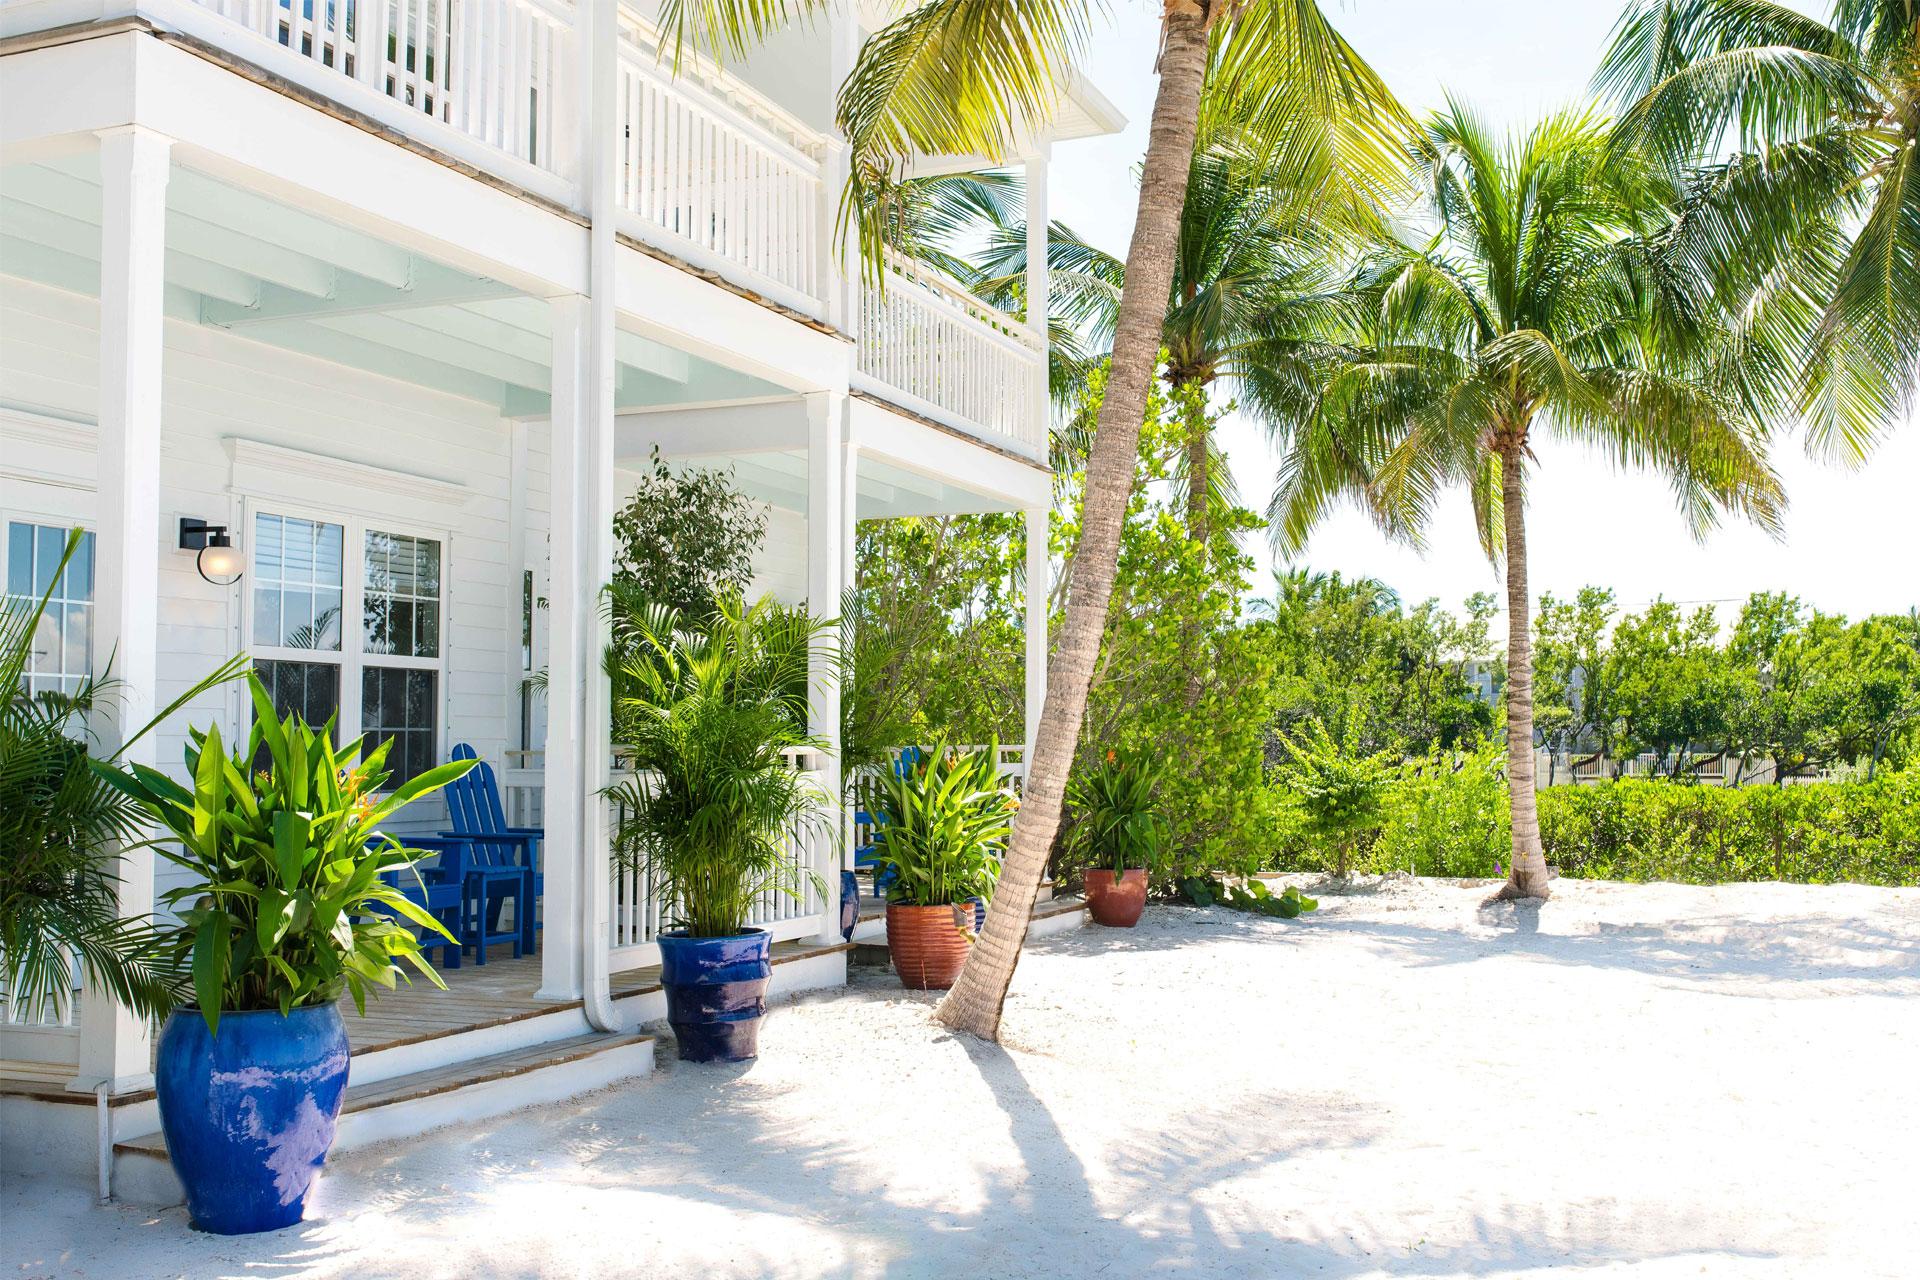 Parrot Key Resort and Villas; Courtesy of Parrot Key